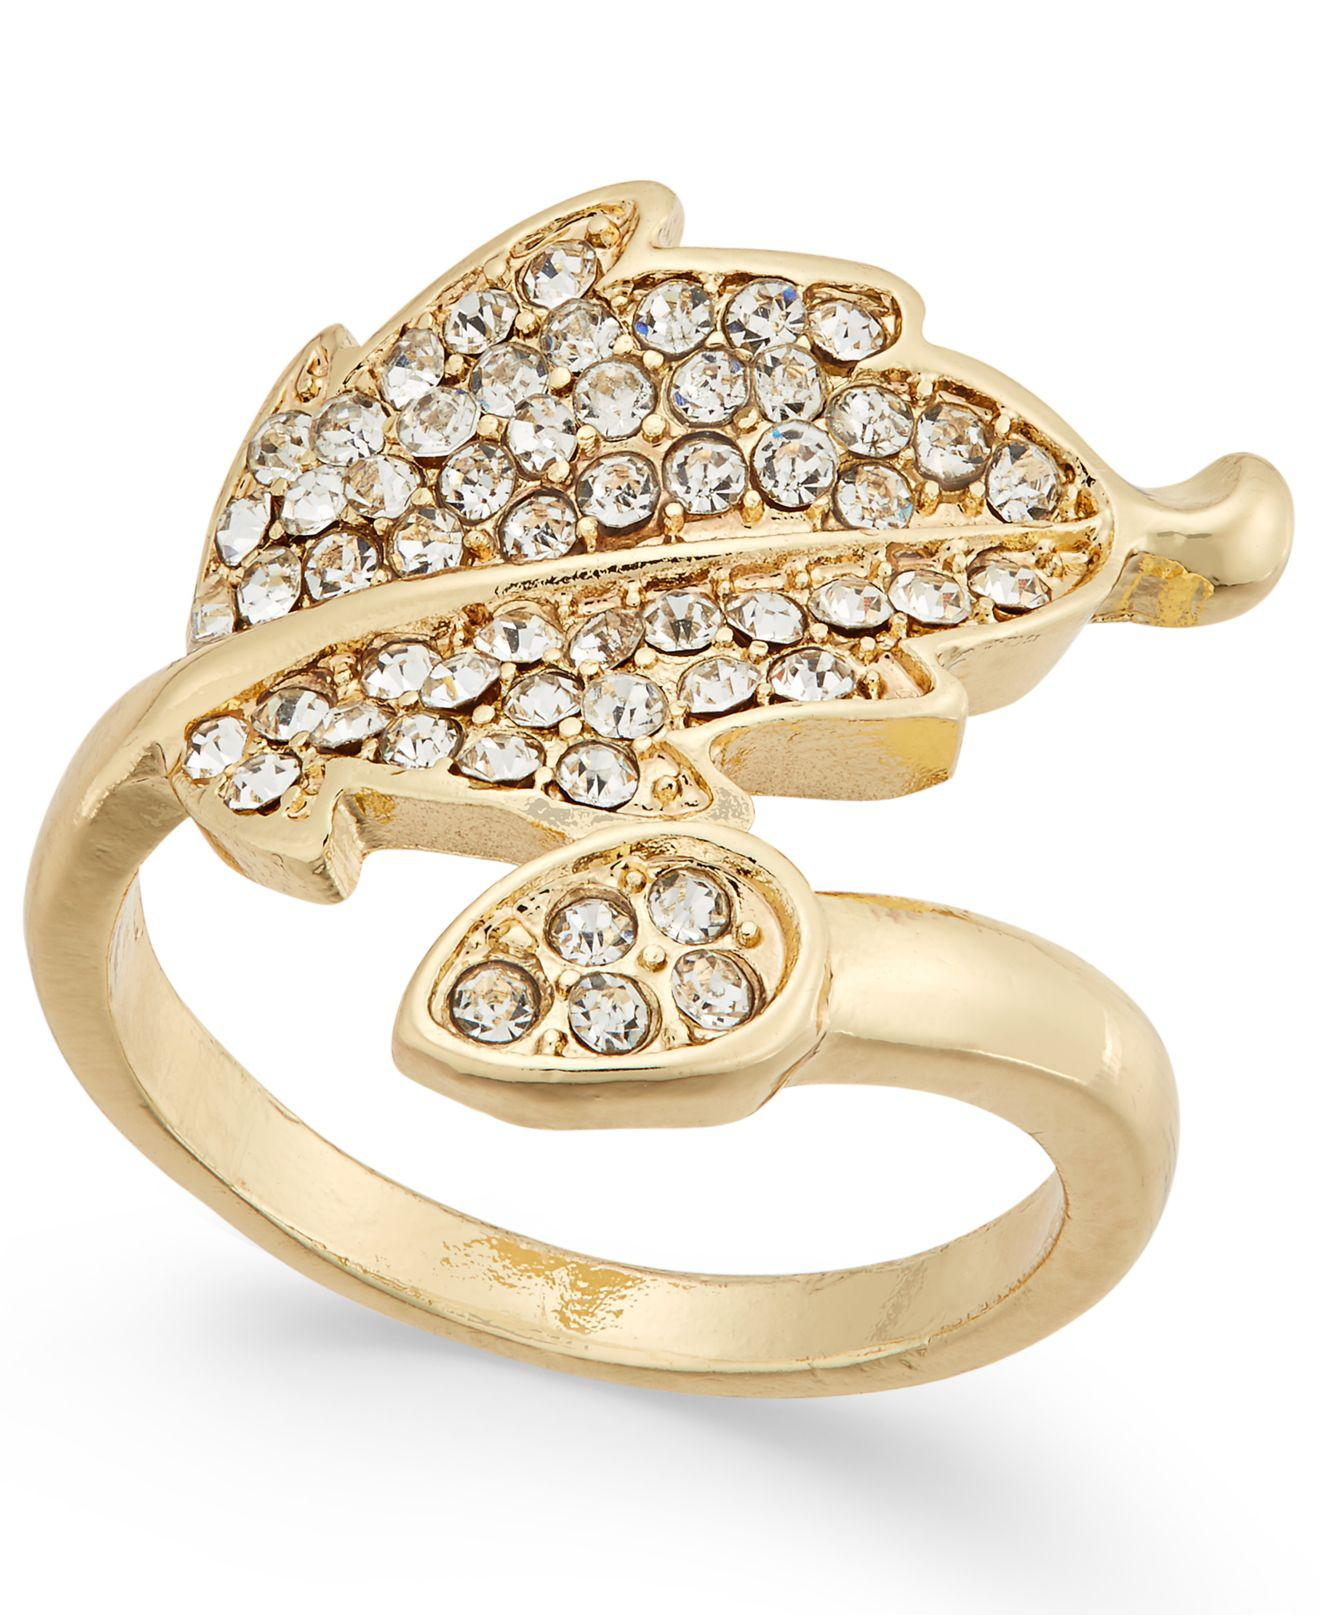 f85136909a2c Lyst - INC International Concepts I.n.c. Gold-tone Pavé Leaf Ring ...